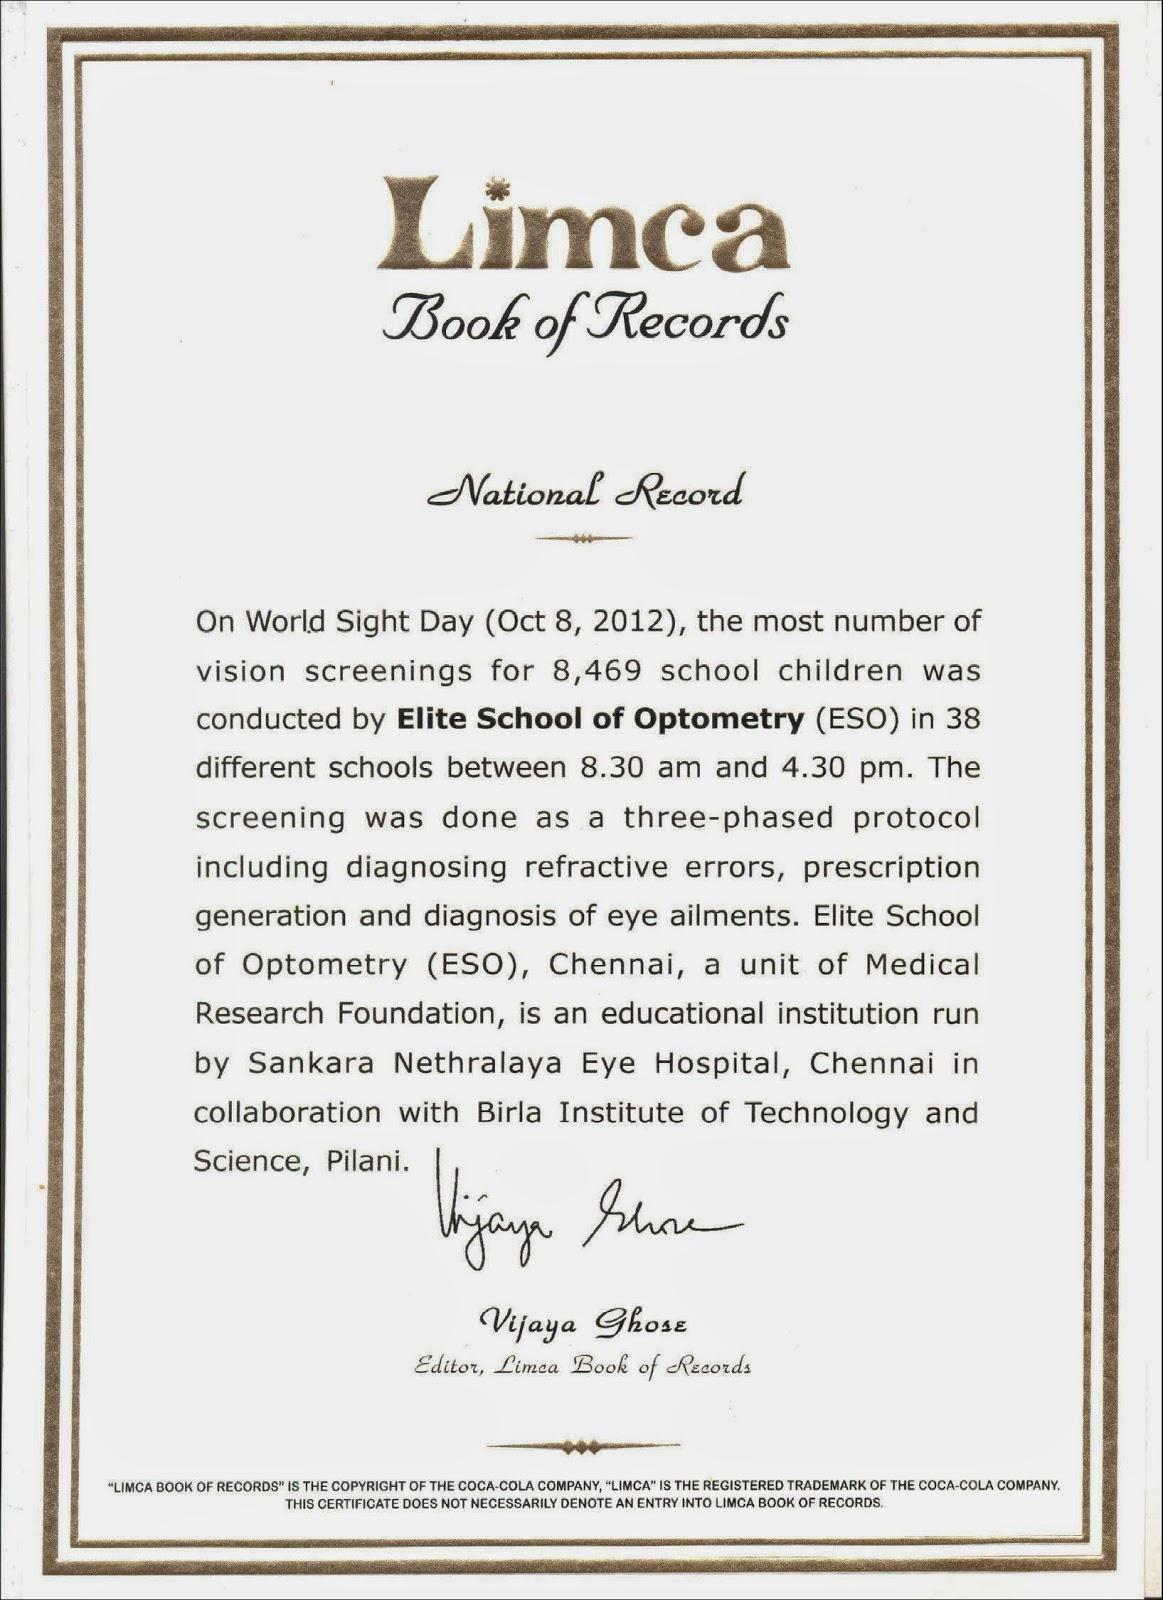 R venkats blog venkataramanan ramasethu 2014 elite school of optometry eso sets a national record aiddatafo Gallery